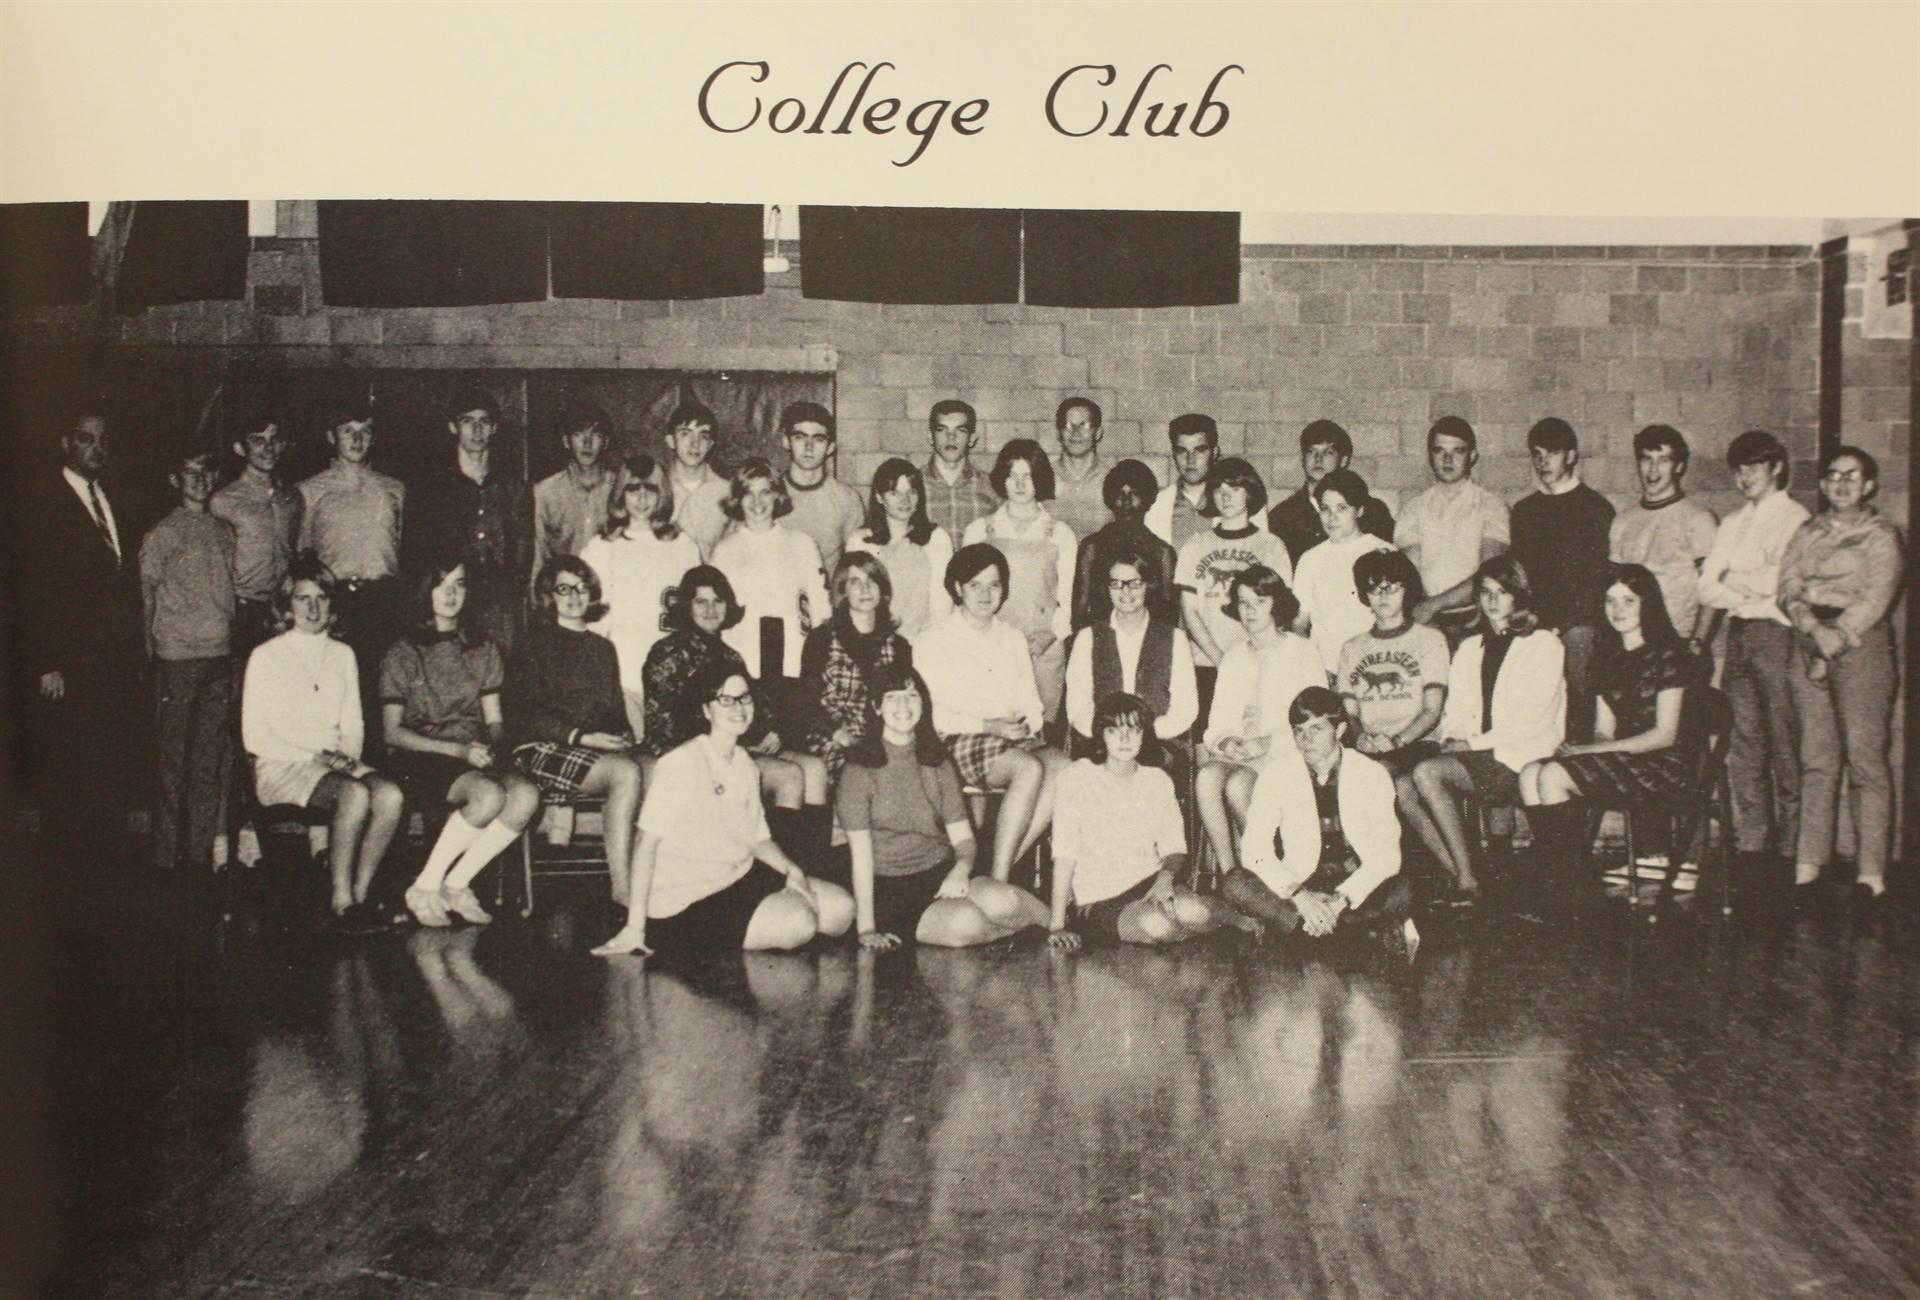 1970 College Club